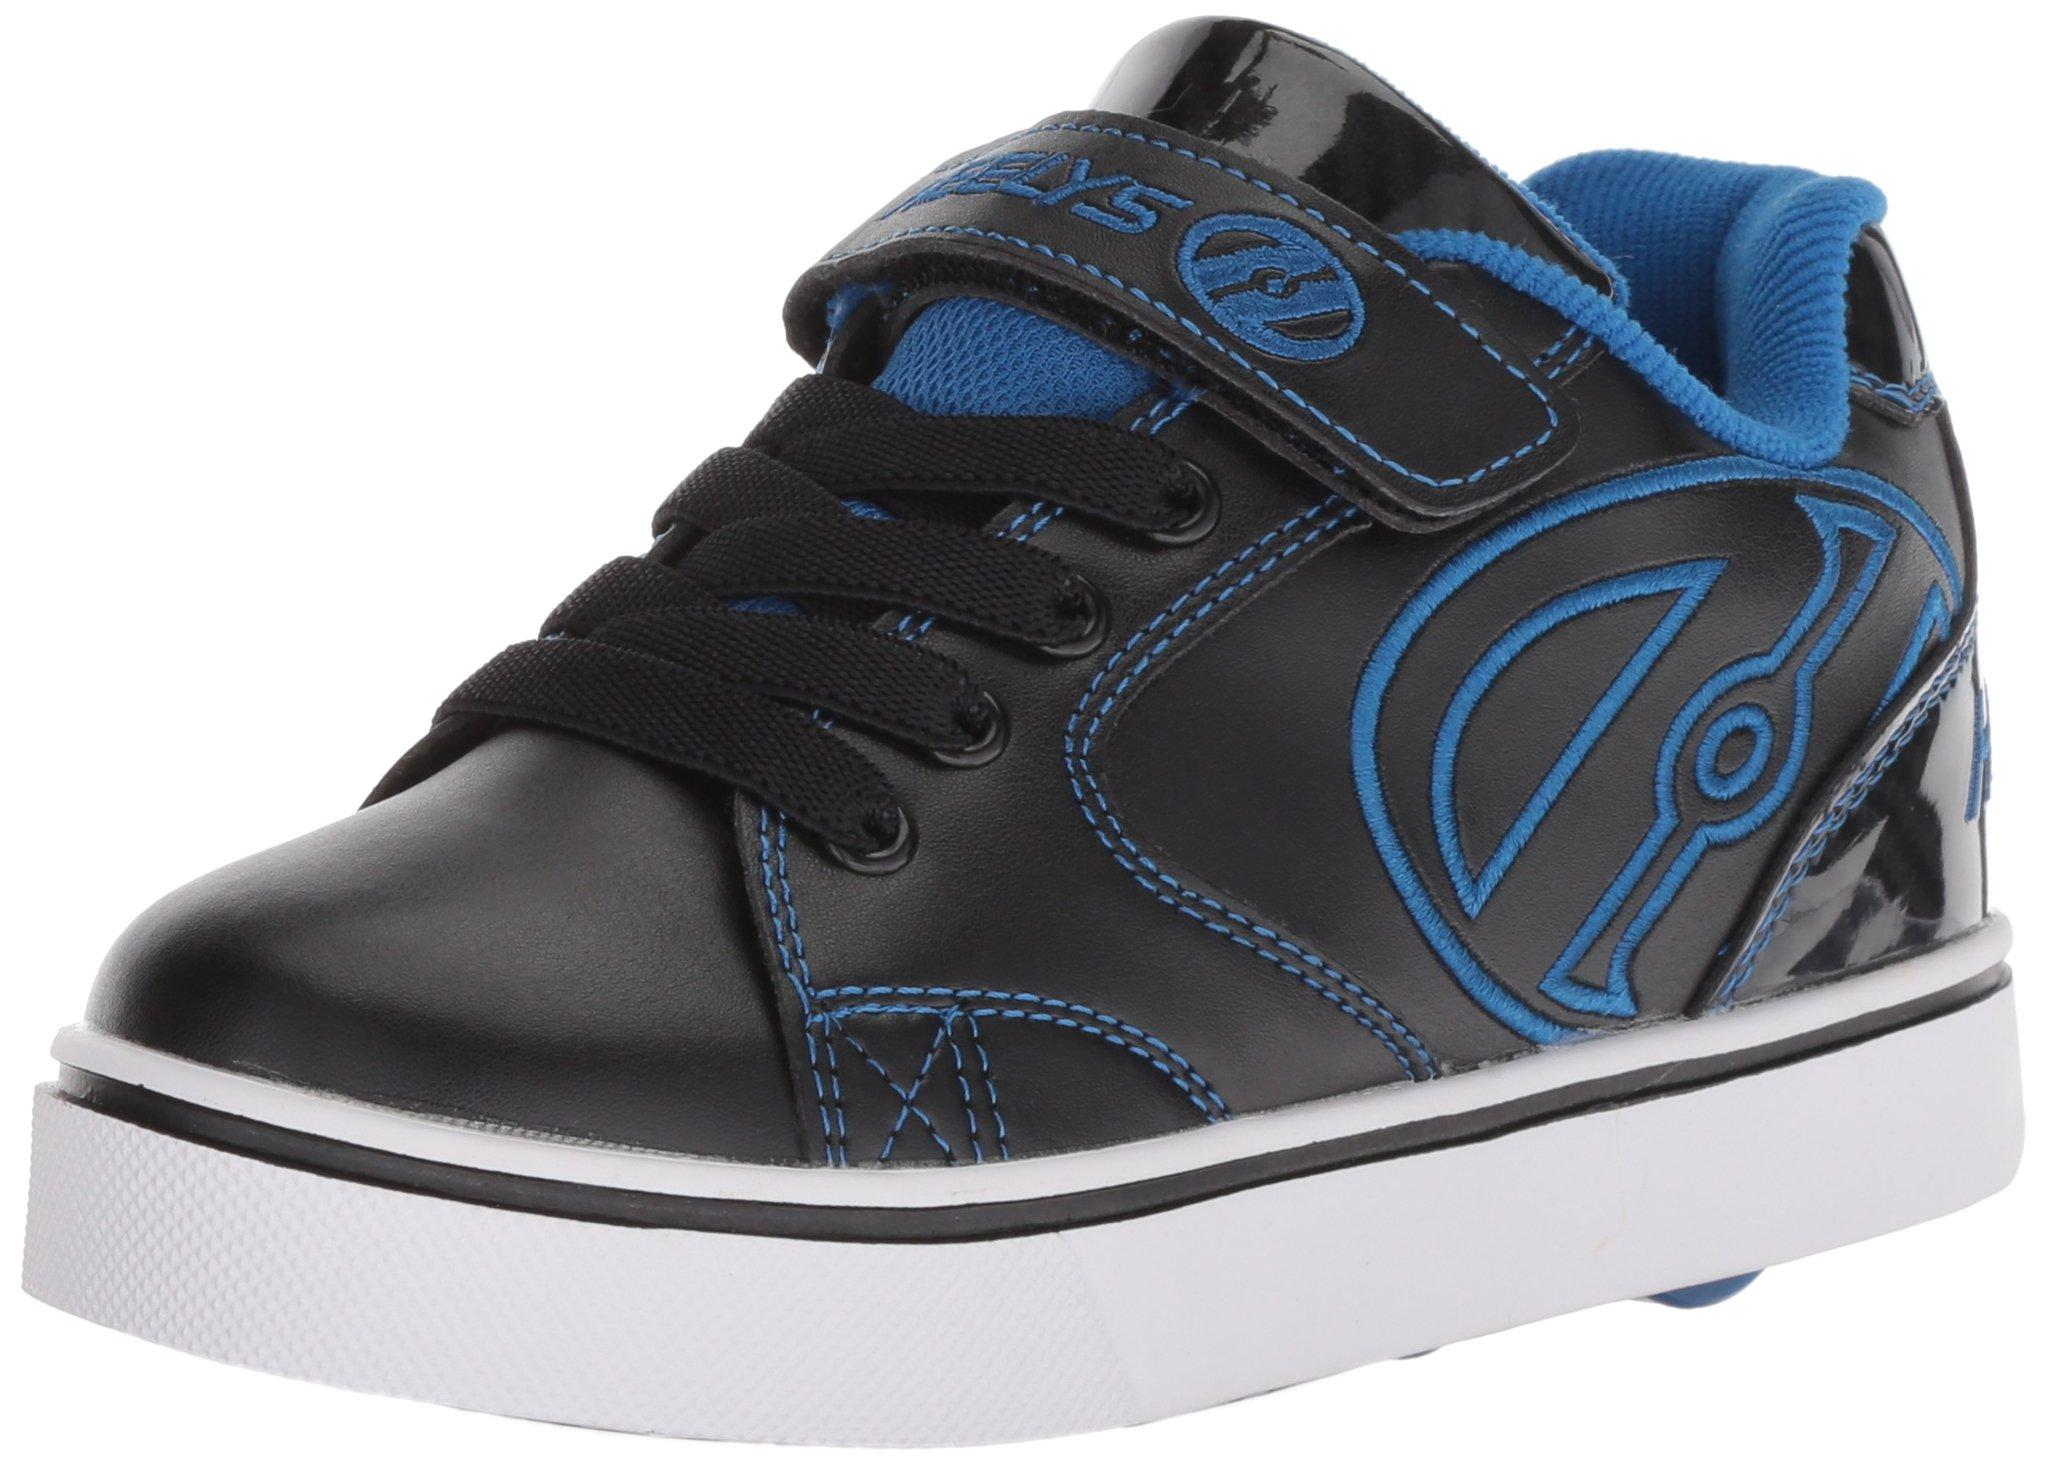 Heelys Boys' Vopel X2 Tennis Shoe, Black/Royal, 3 Medium US Little Kid